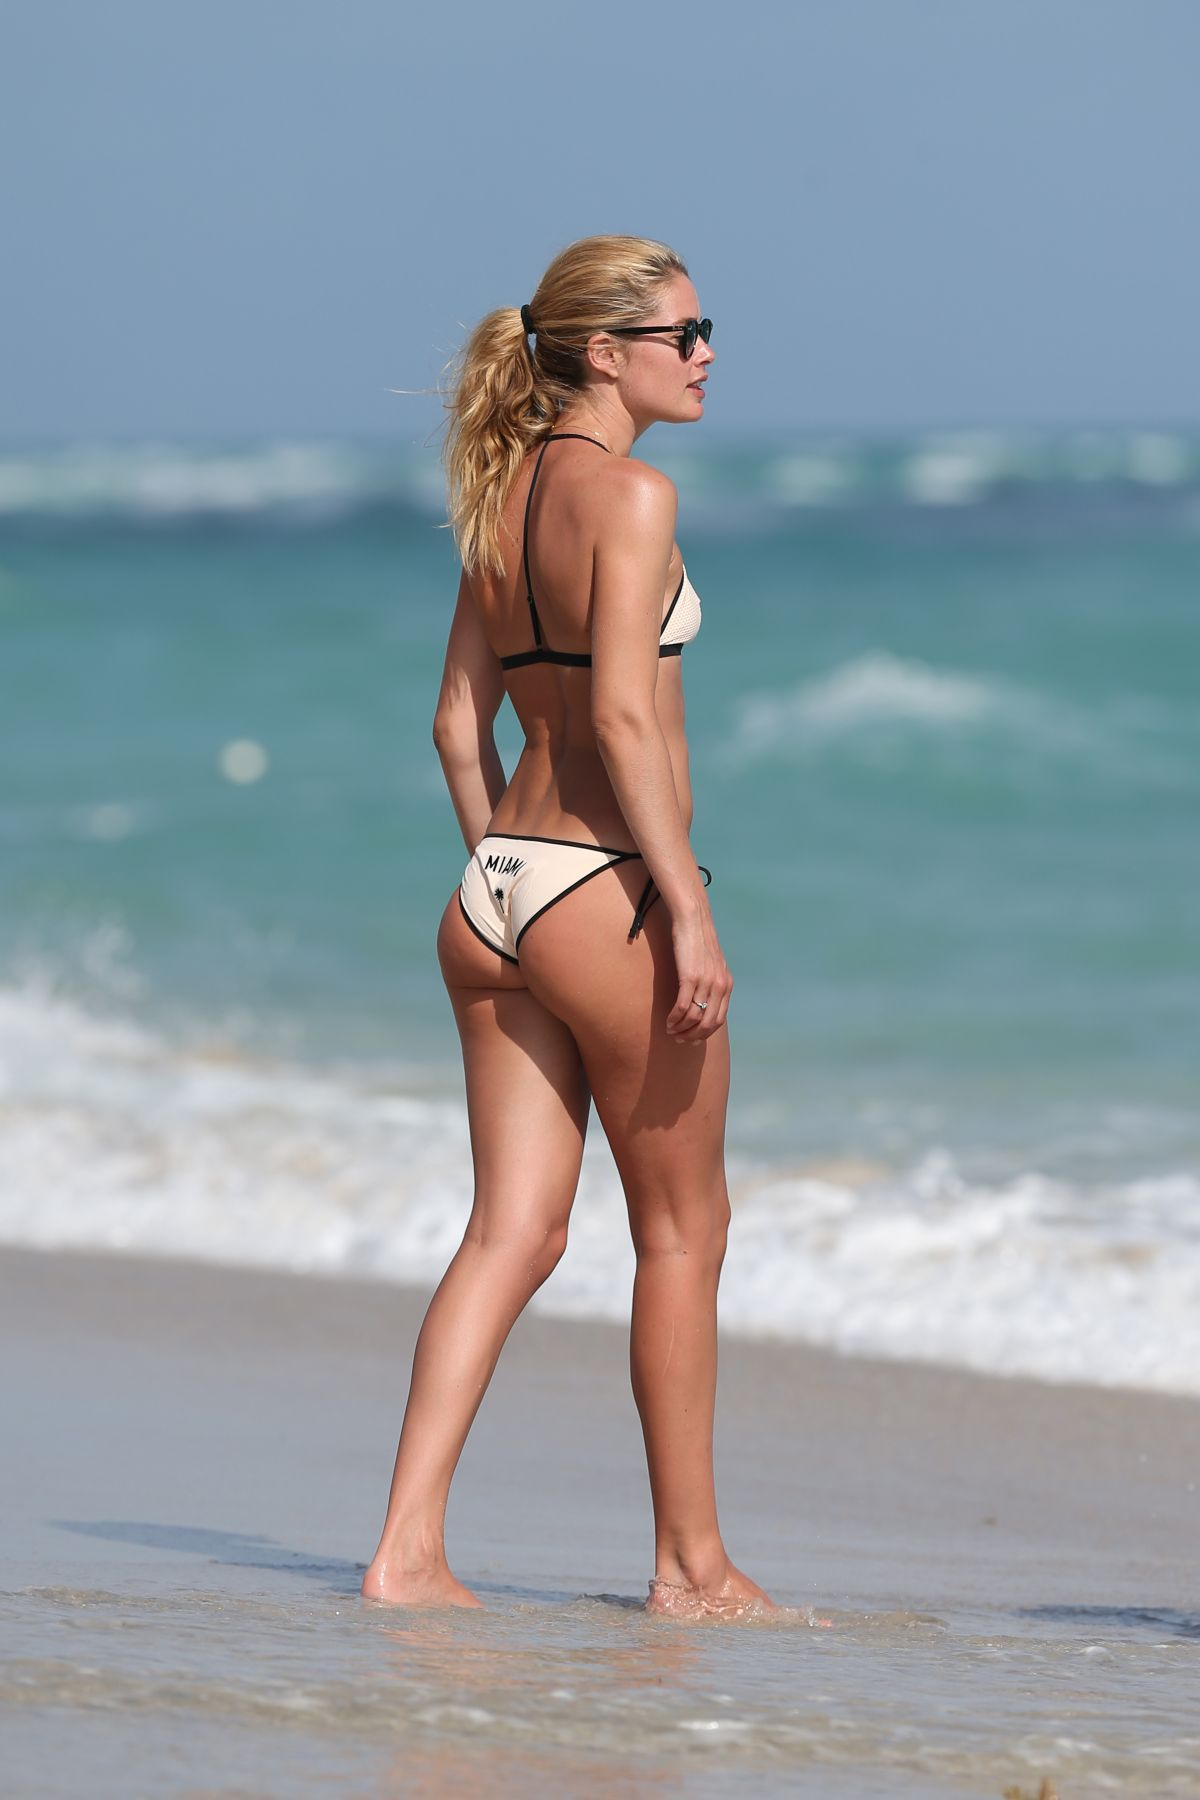 Watch Doutzen kroes in bikini at the beach in ibiza video